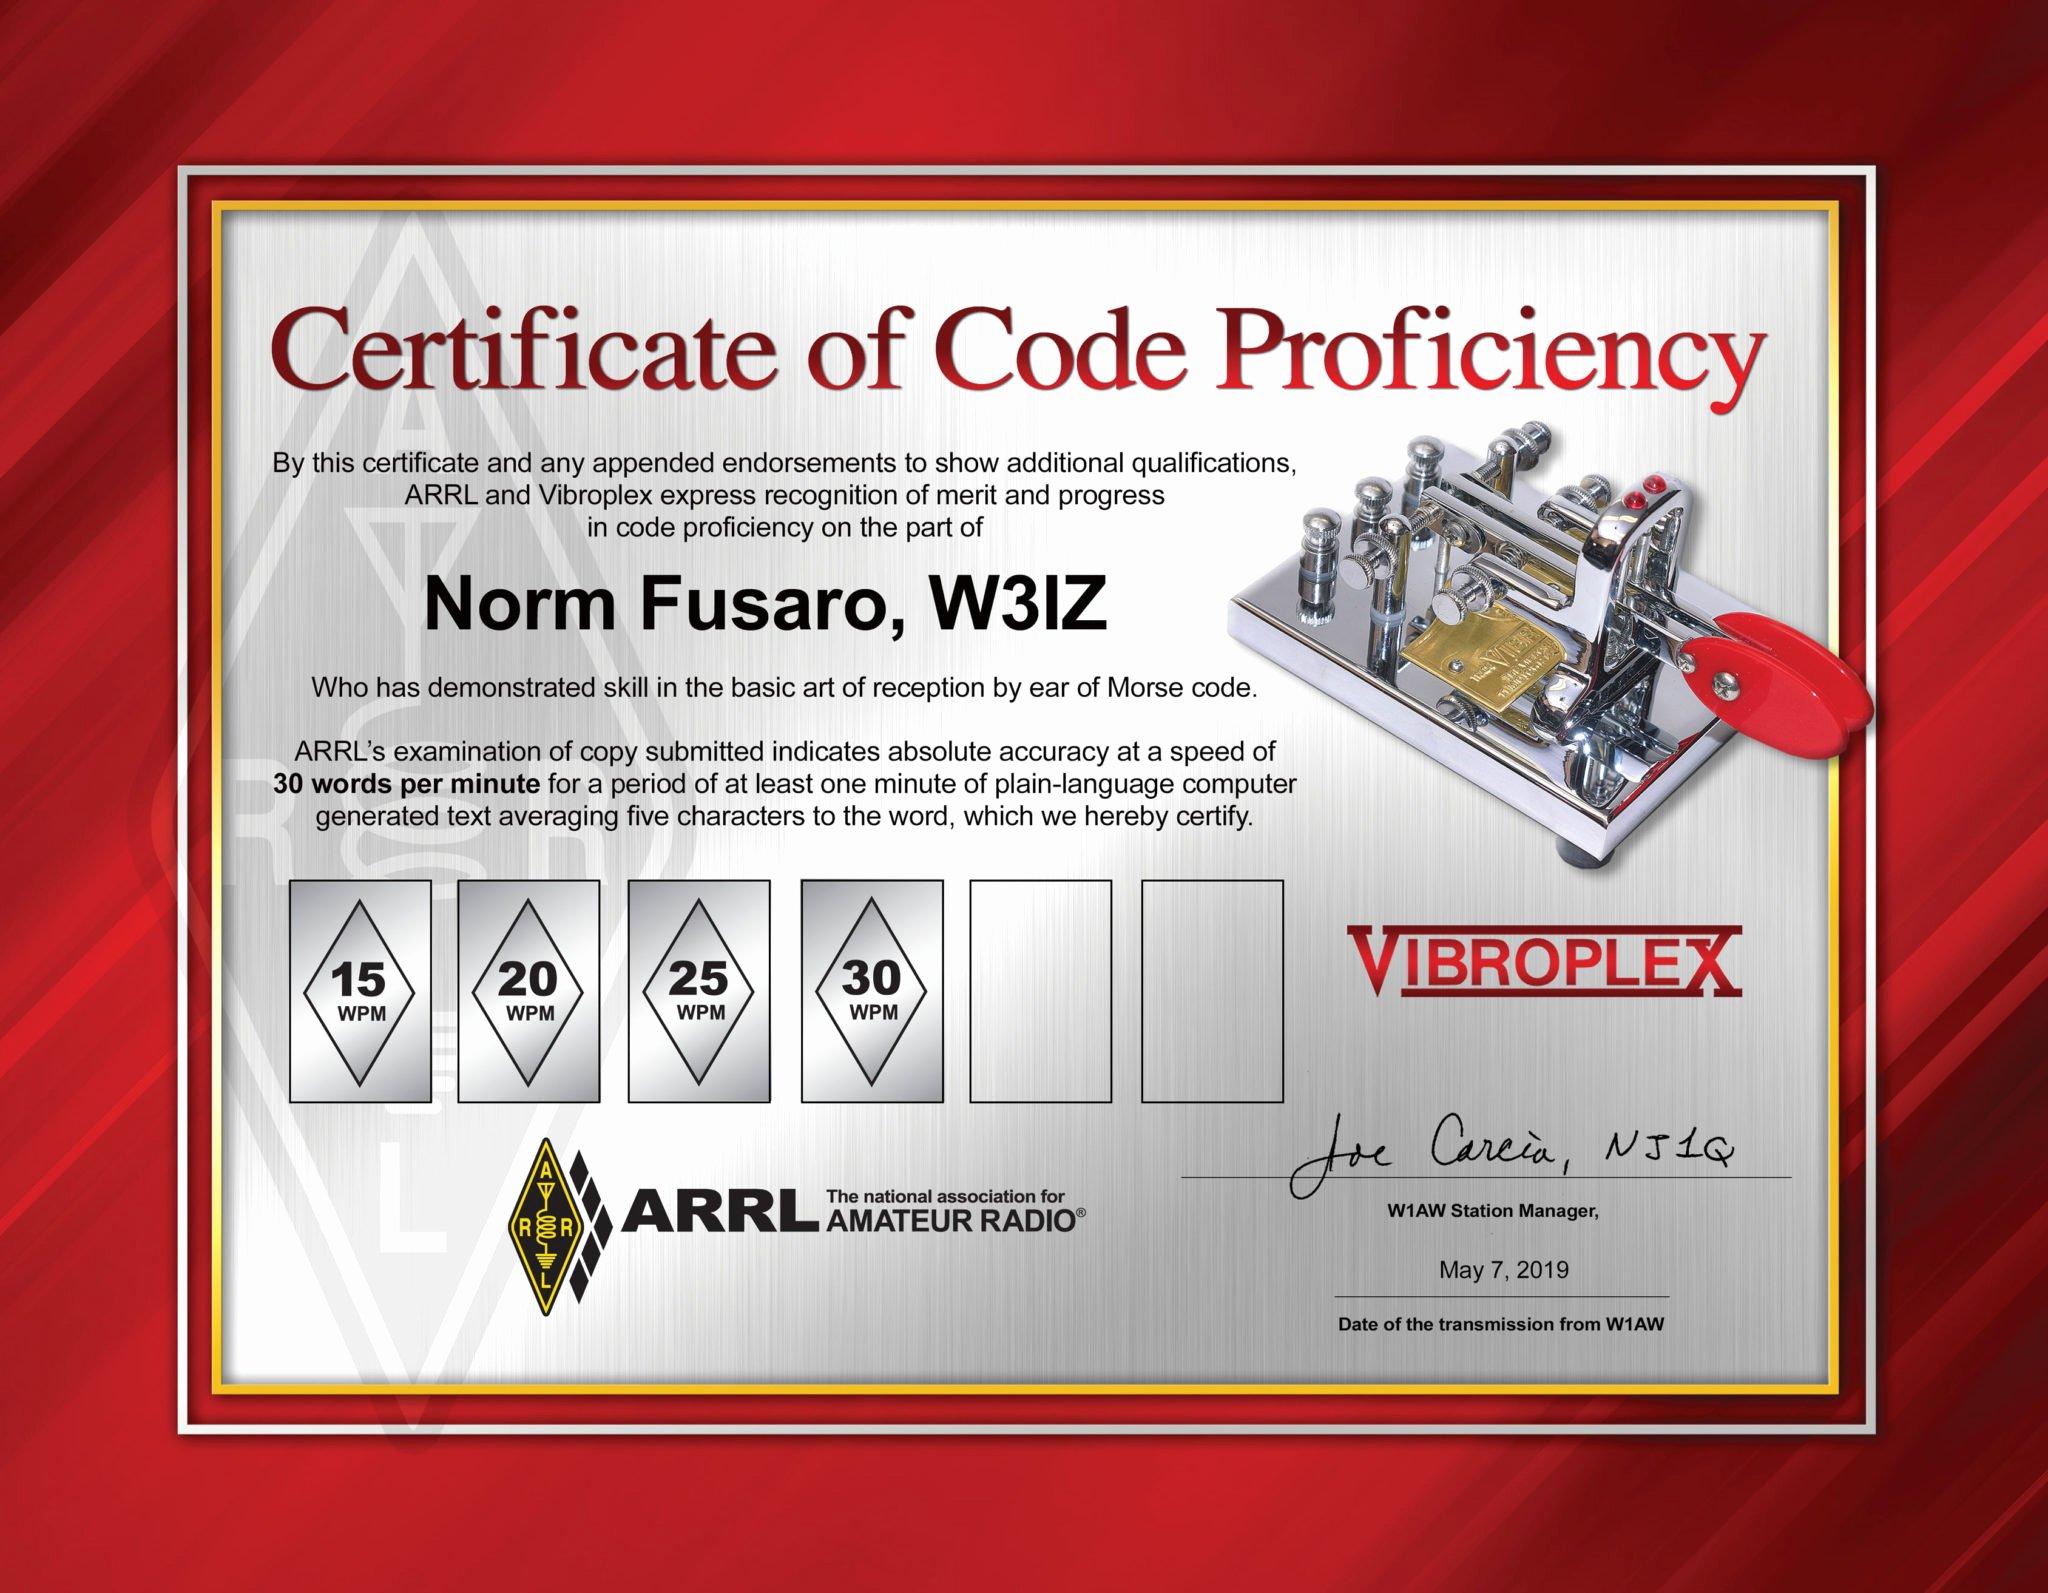 Ham Radio Certificate Maker Beautiful Arrl Amping Up Code Proficiency Awards Kb6nu S Ham Radio